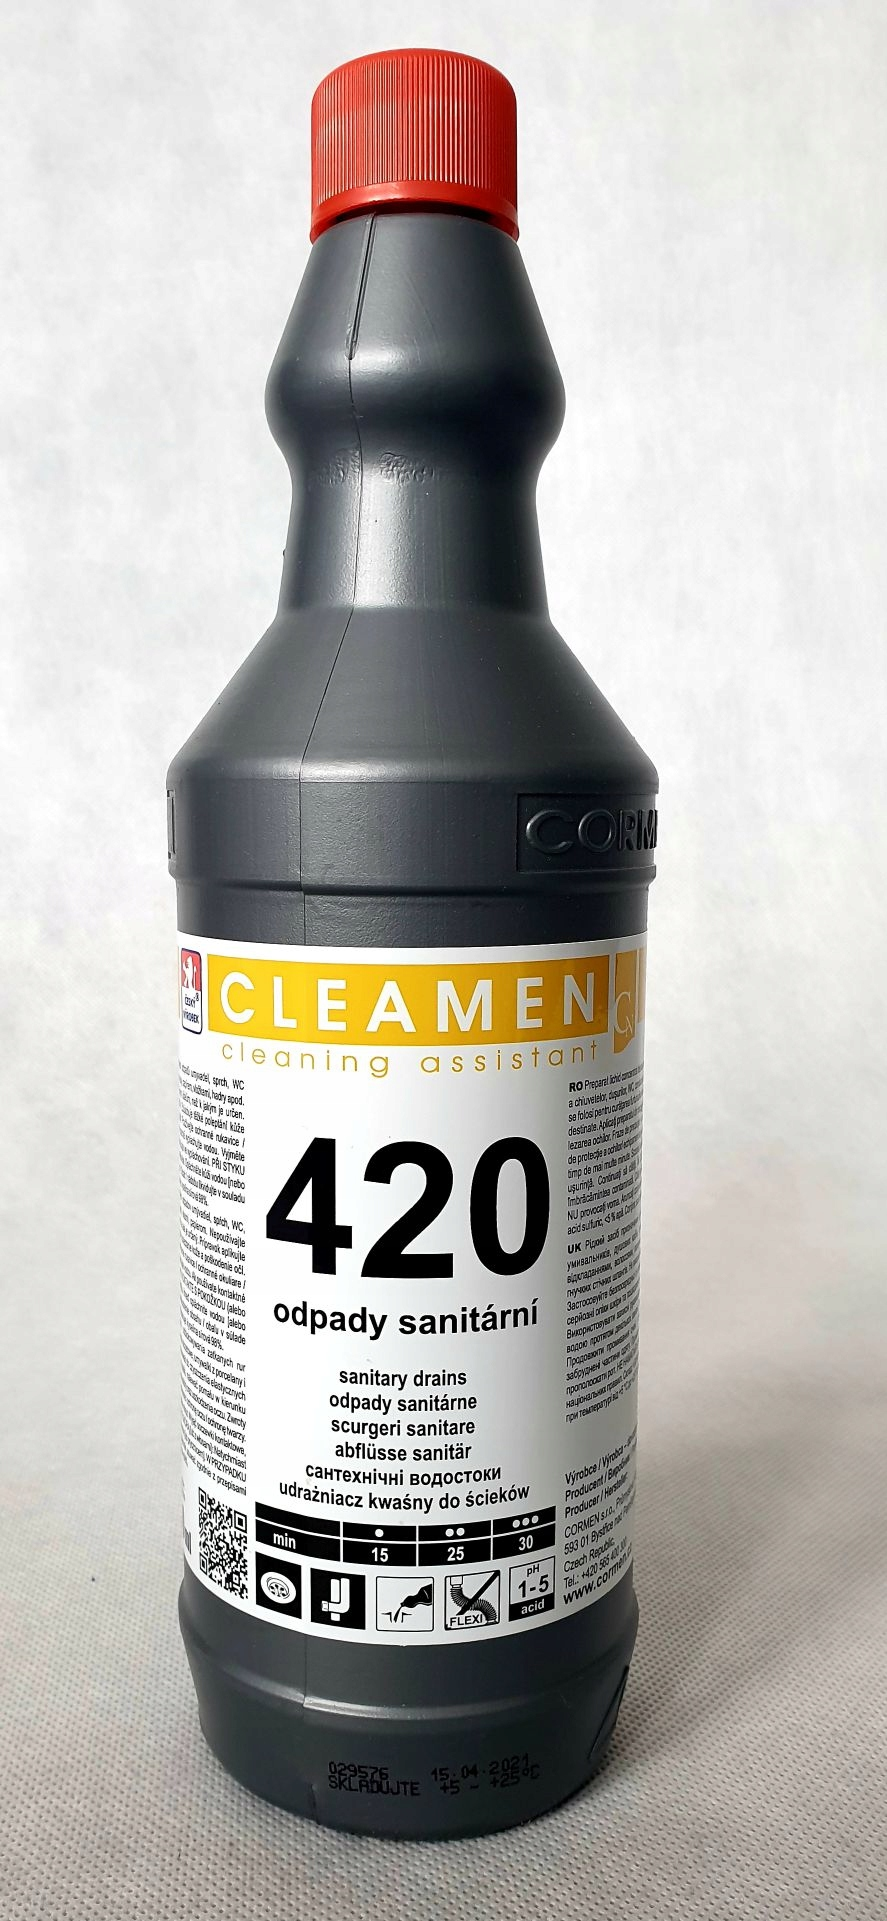 CLEAMEN 420 UDRAŻNIACZ ОТЛИВОВ САНИТАРНЫХ